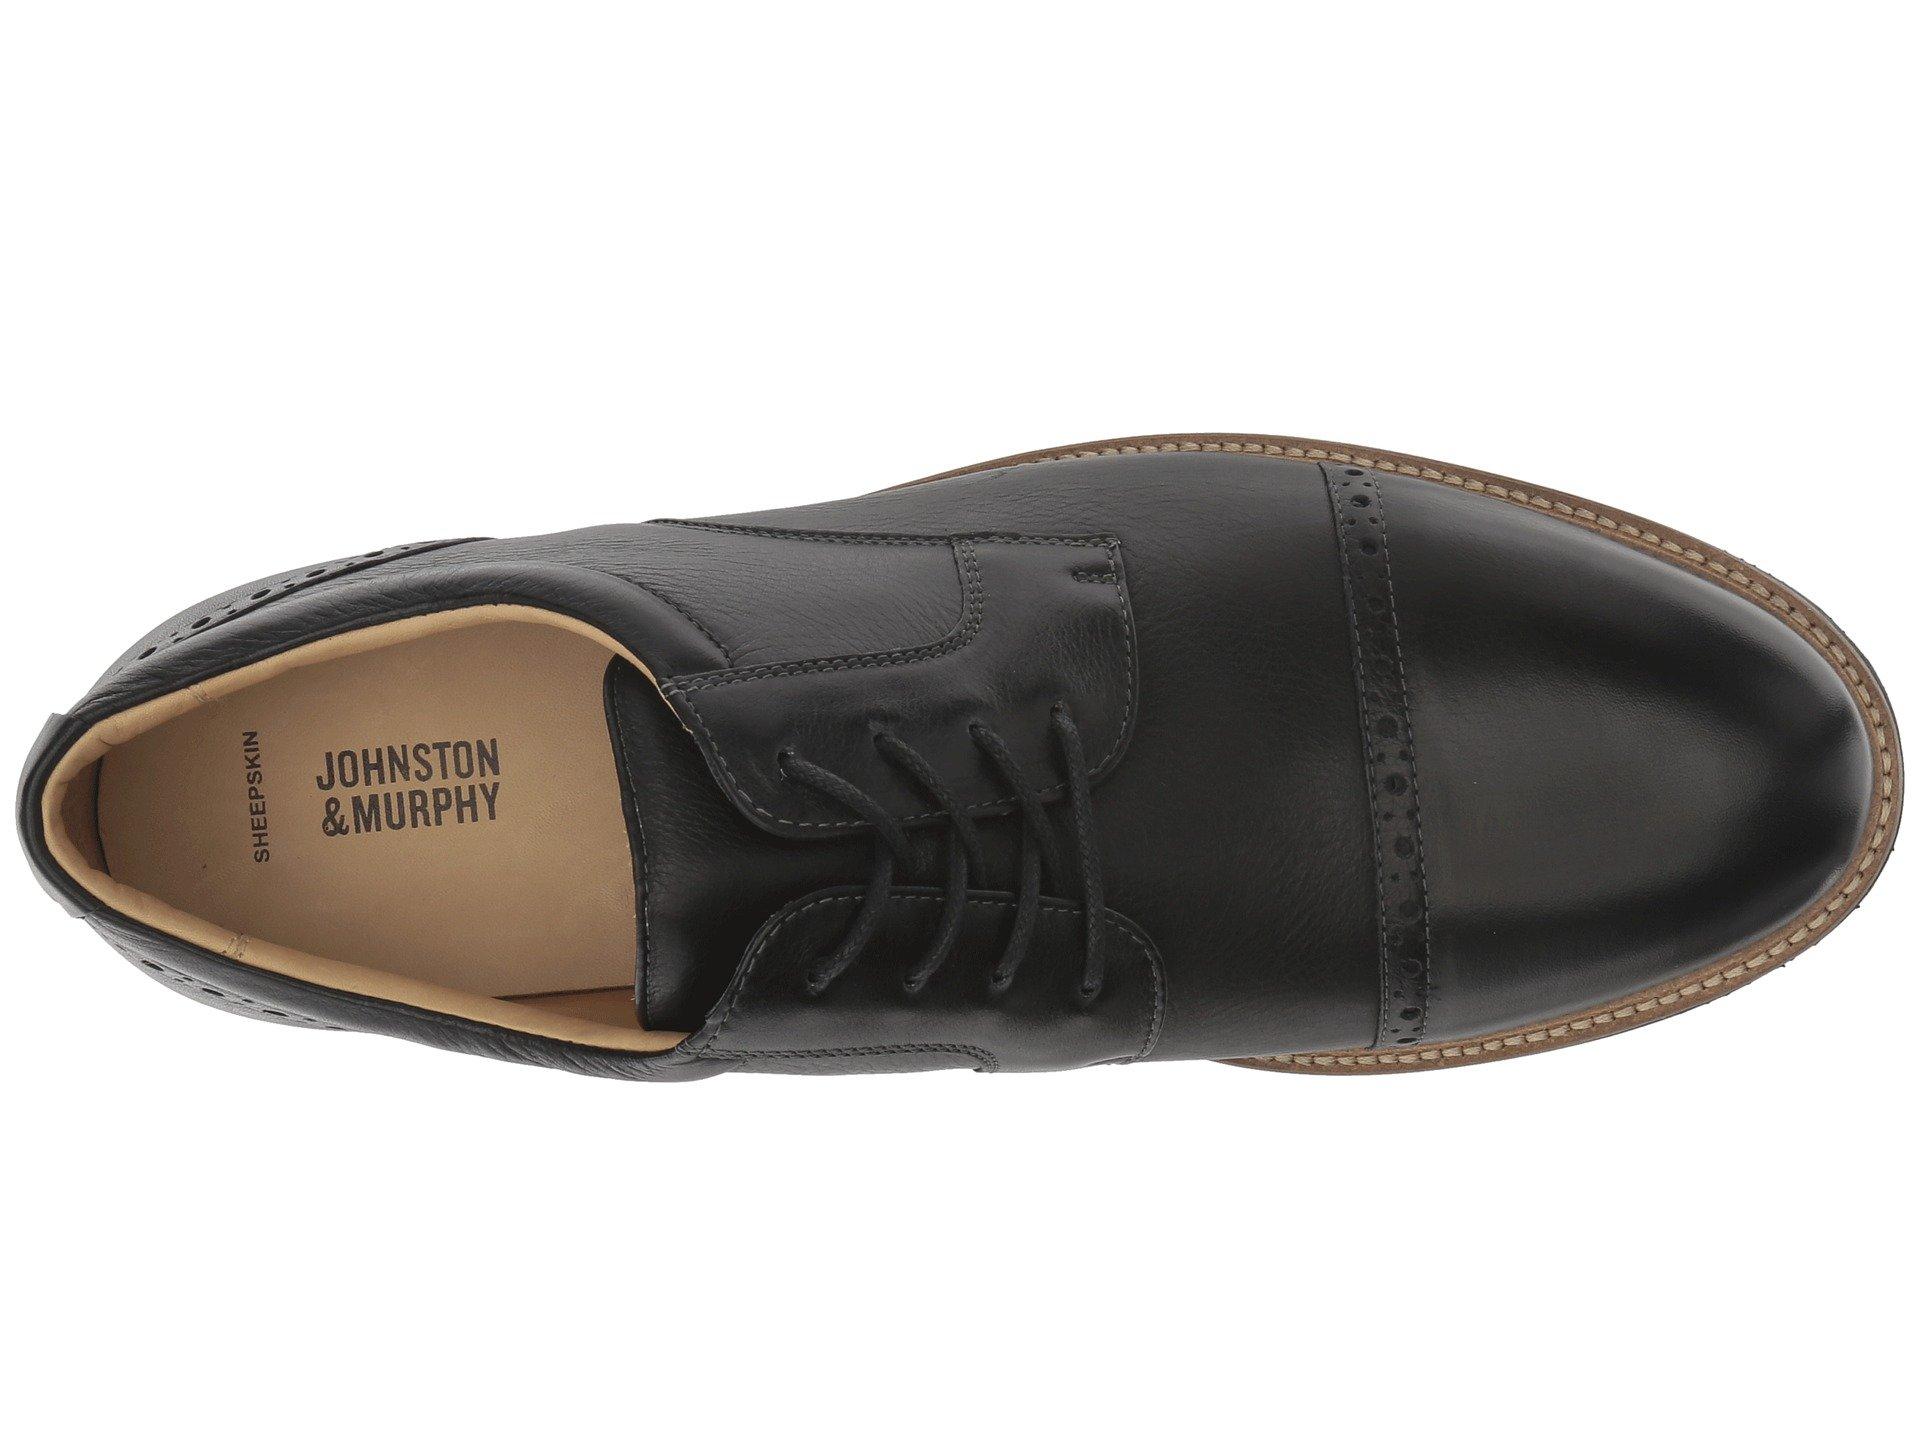 Grain Barlow Casual Murphy Black Full amp; Johnston Soft Toe Cap Dress Oxford EqPBnU7xU